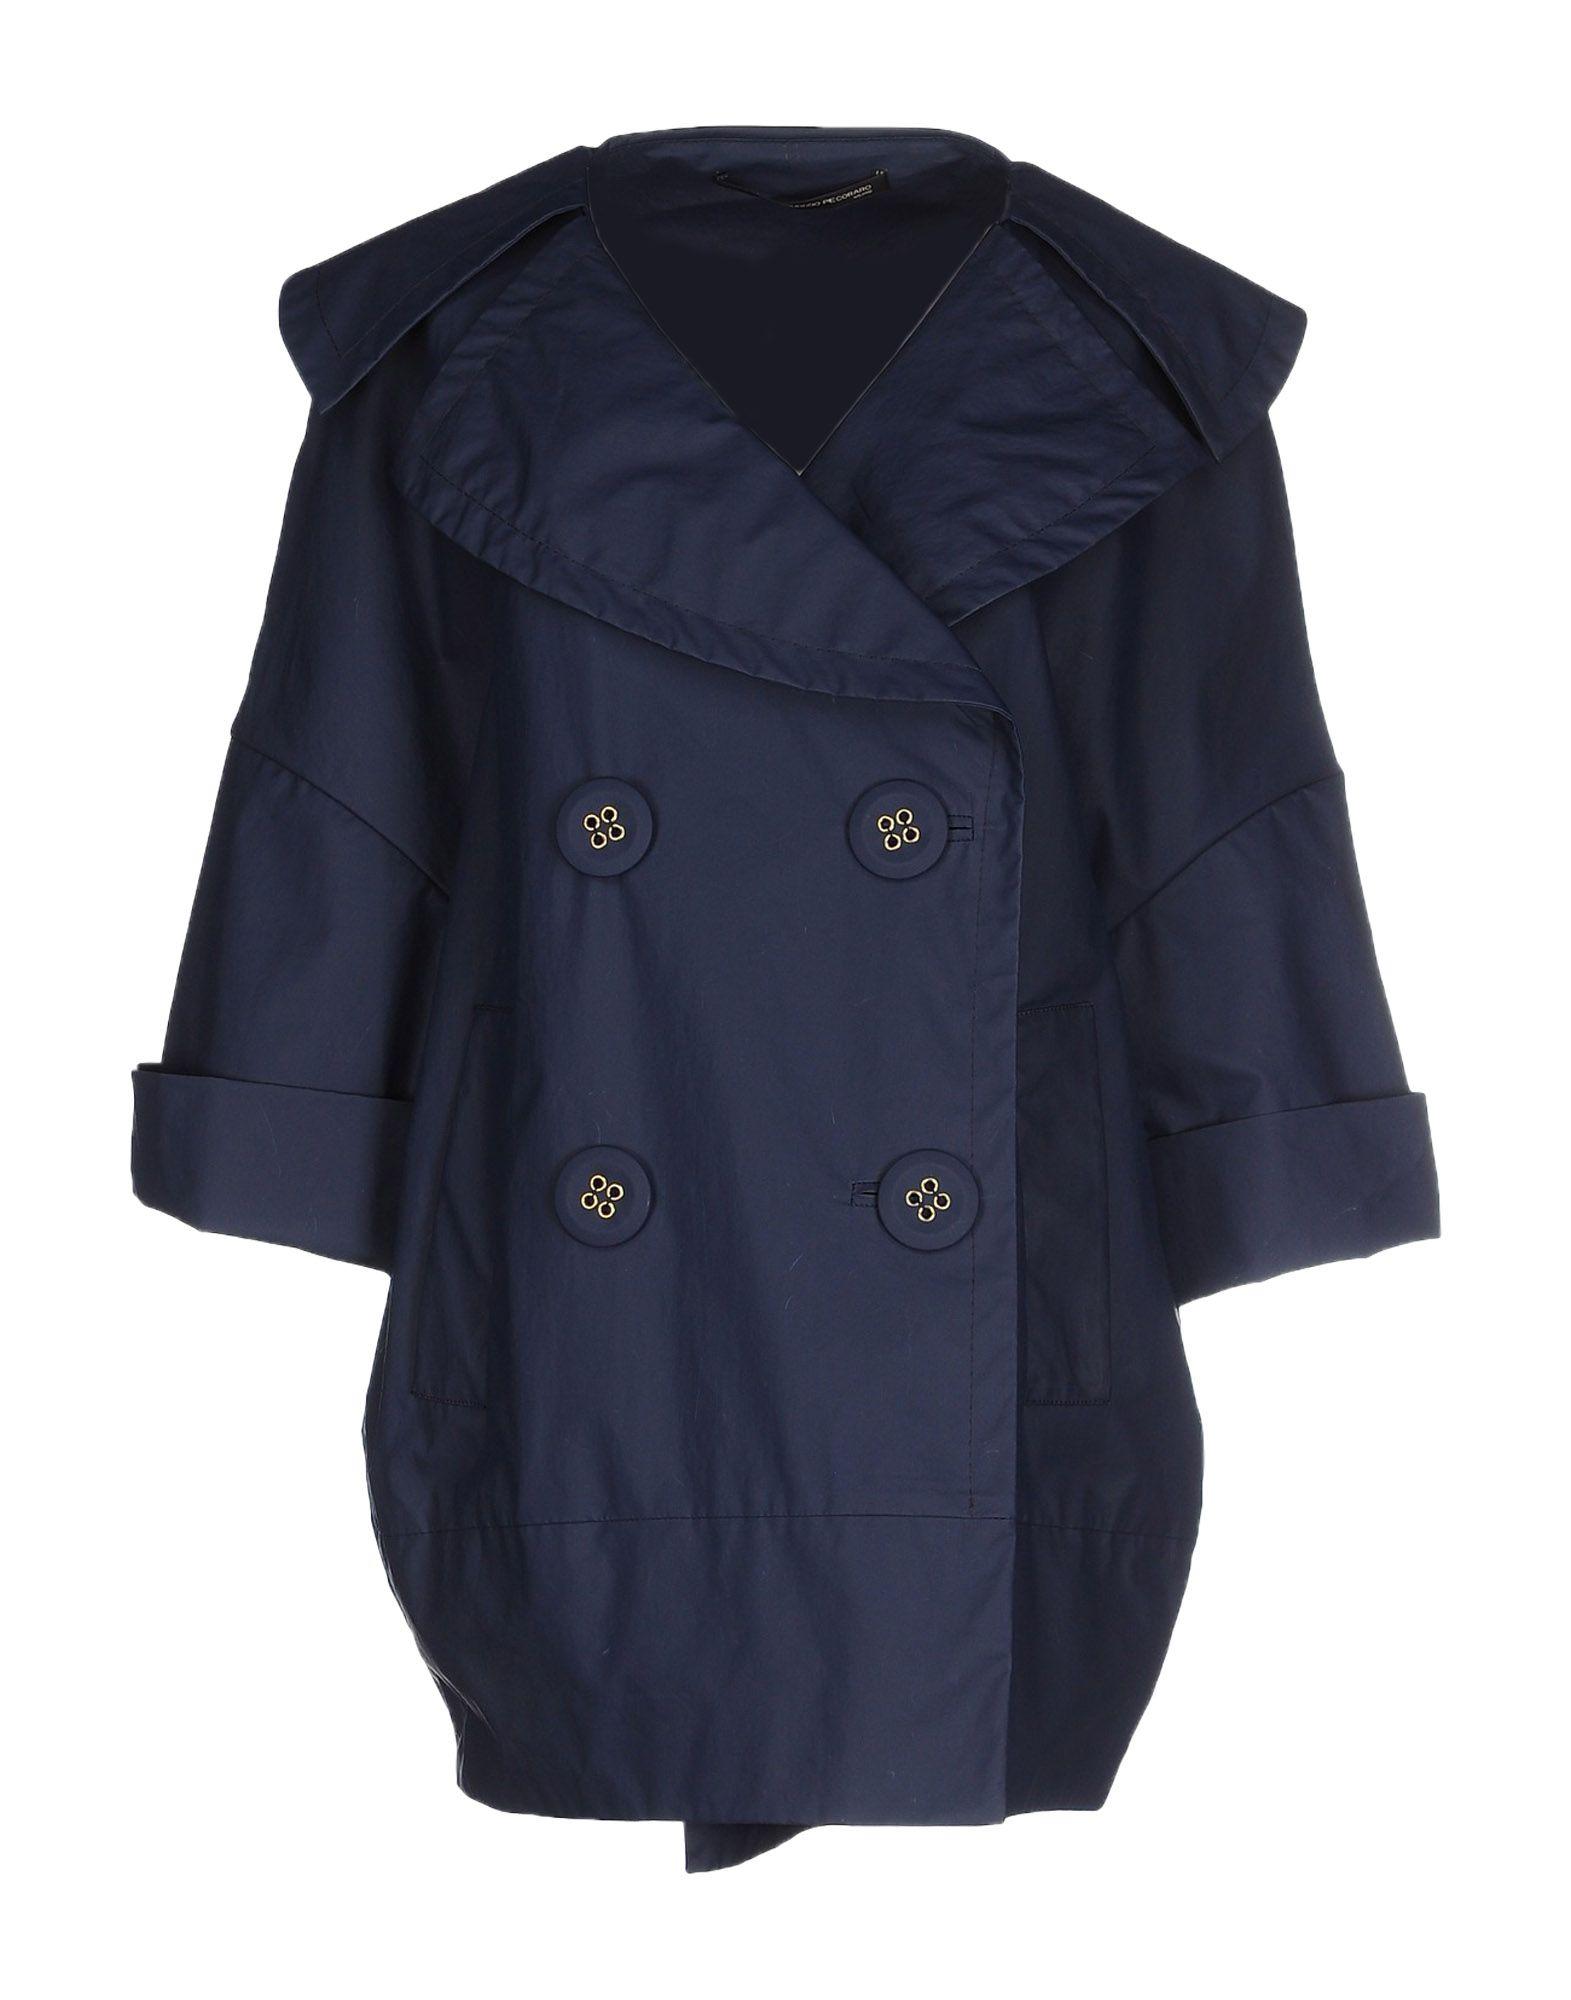 MAURIZIO PECORARO Full-Length Jacket in Dark Blue